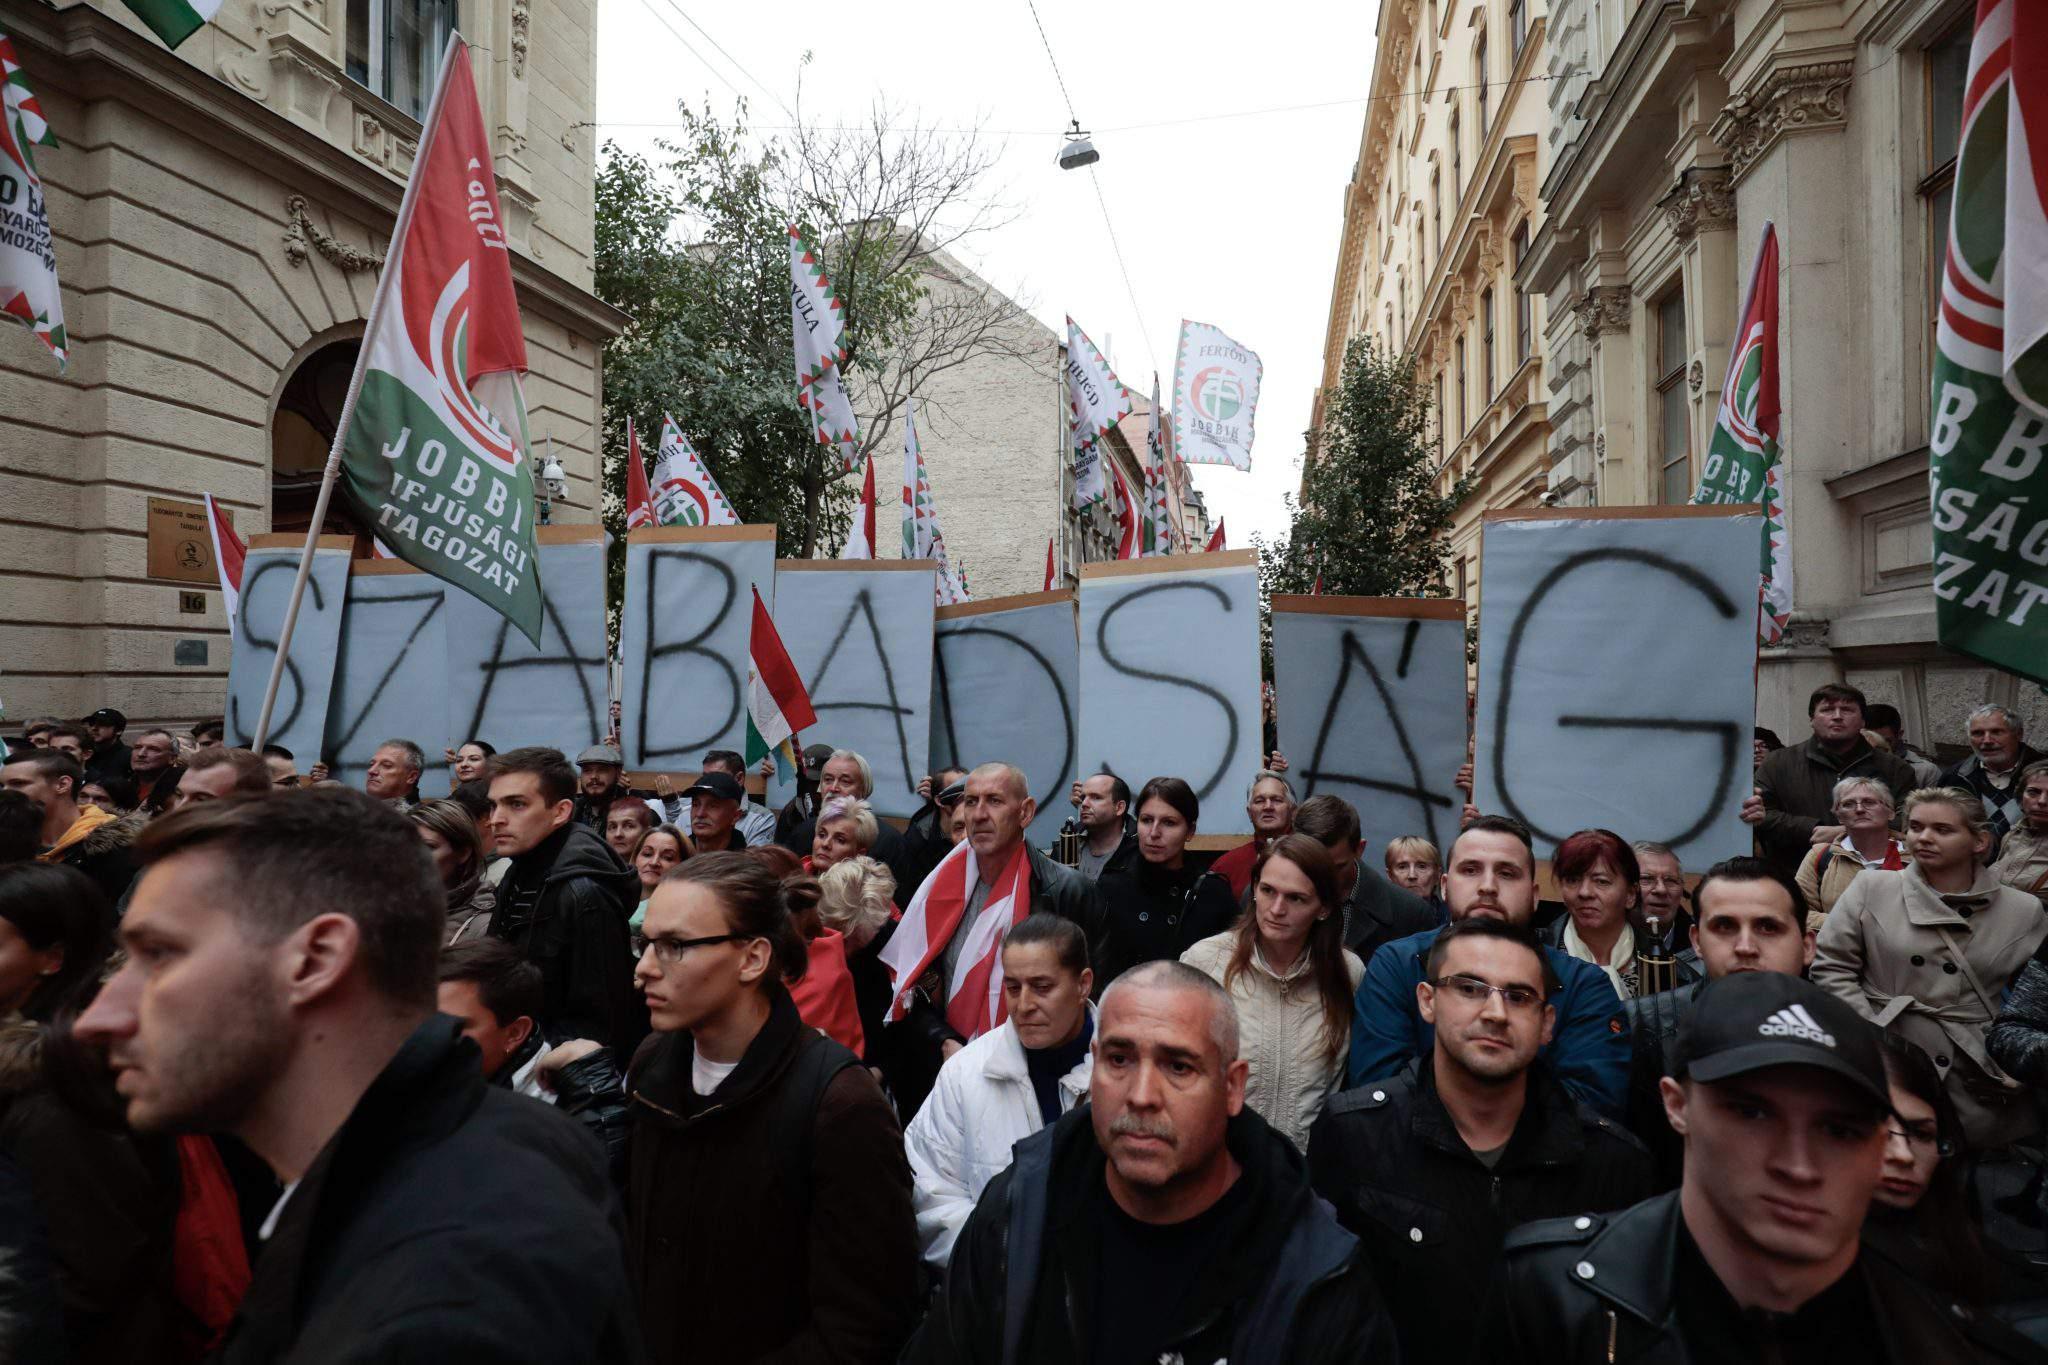 Jobbik party Hungary demonstration